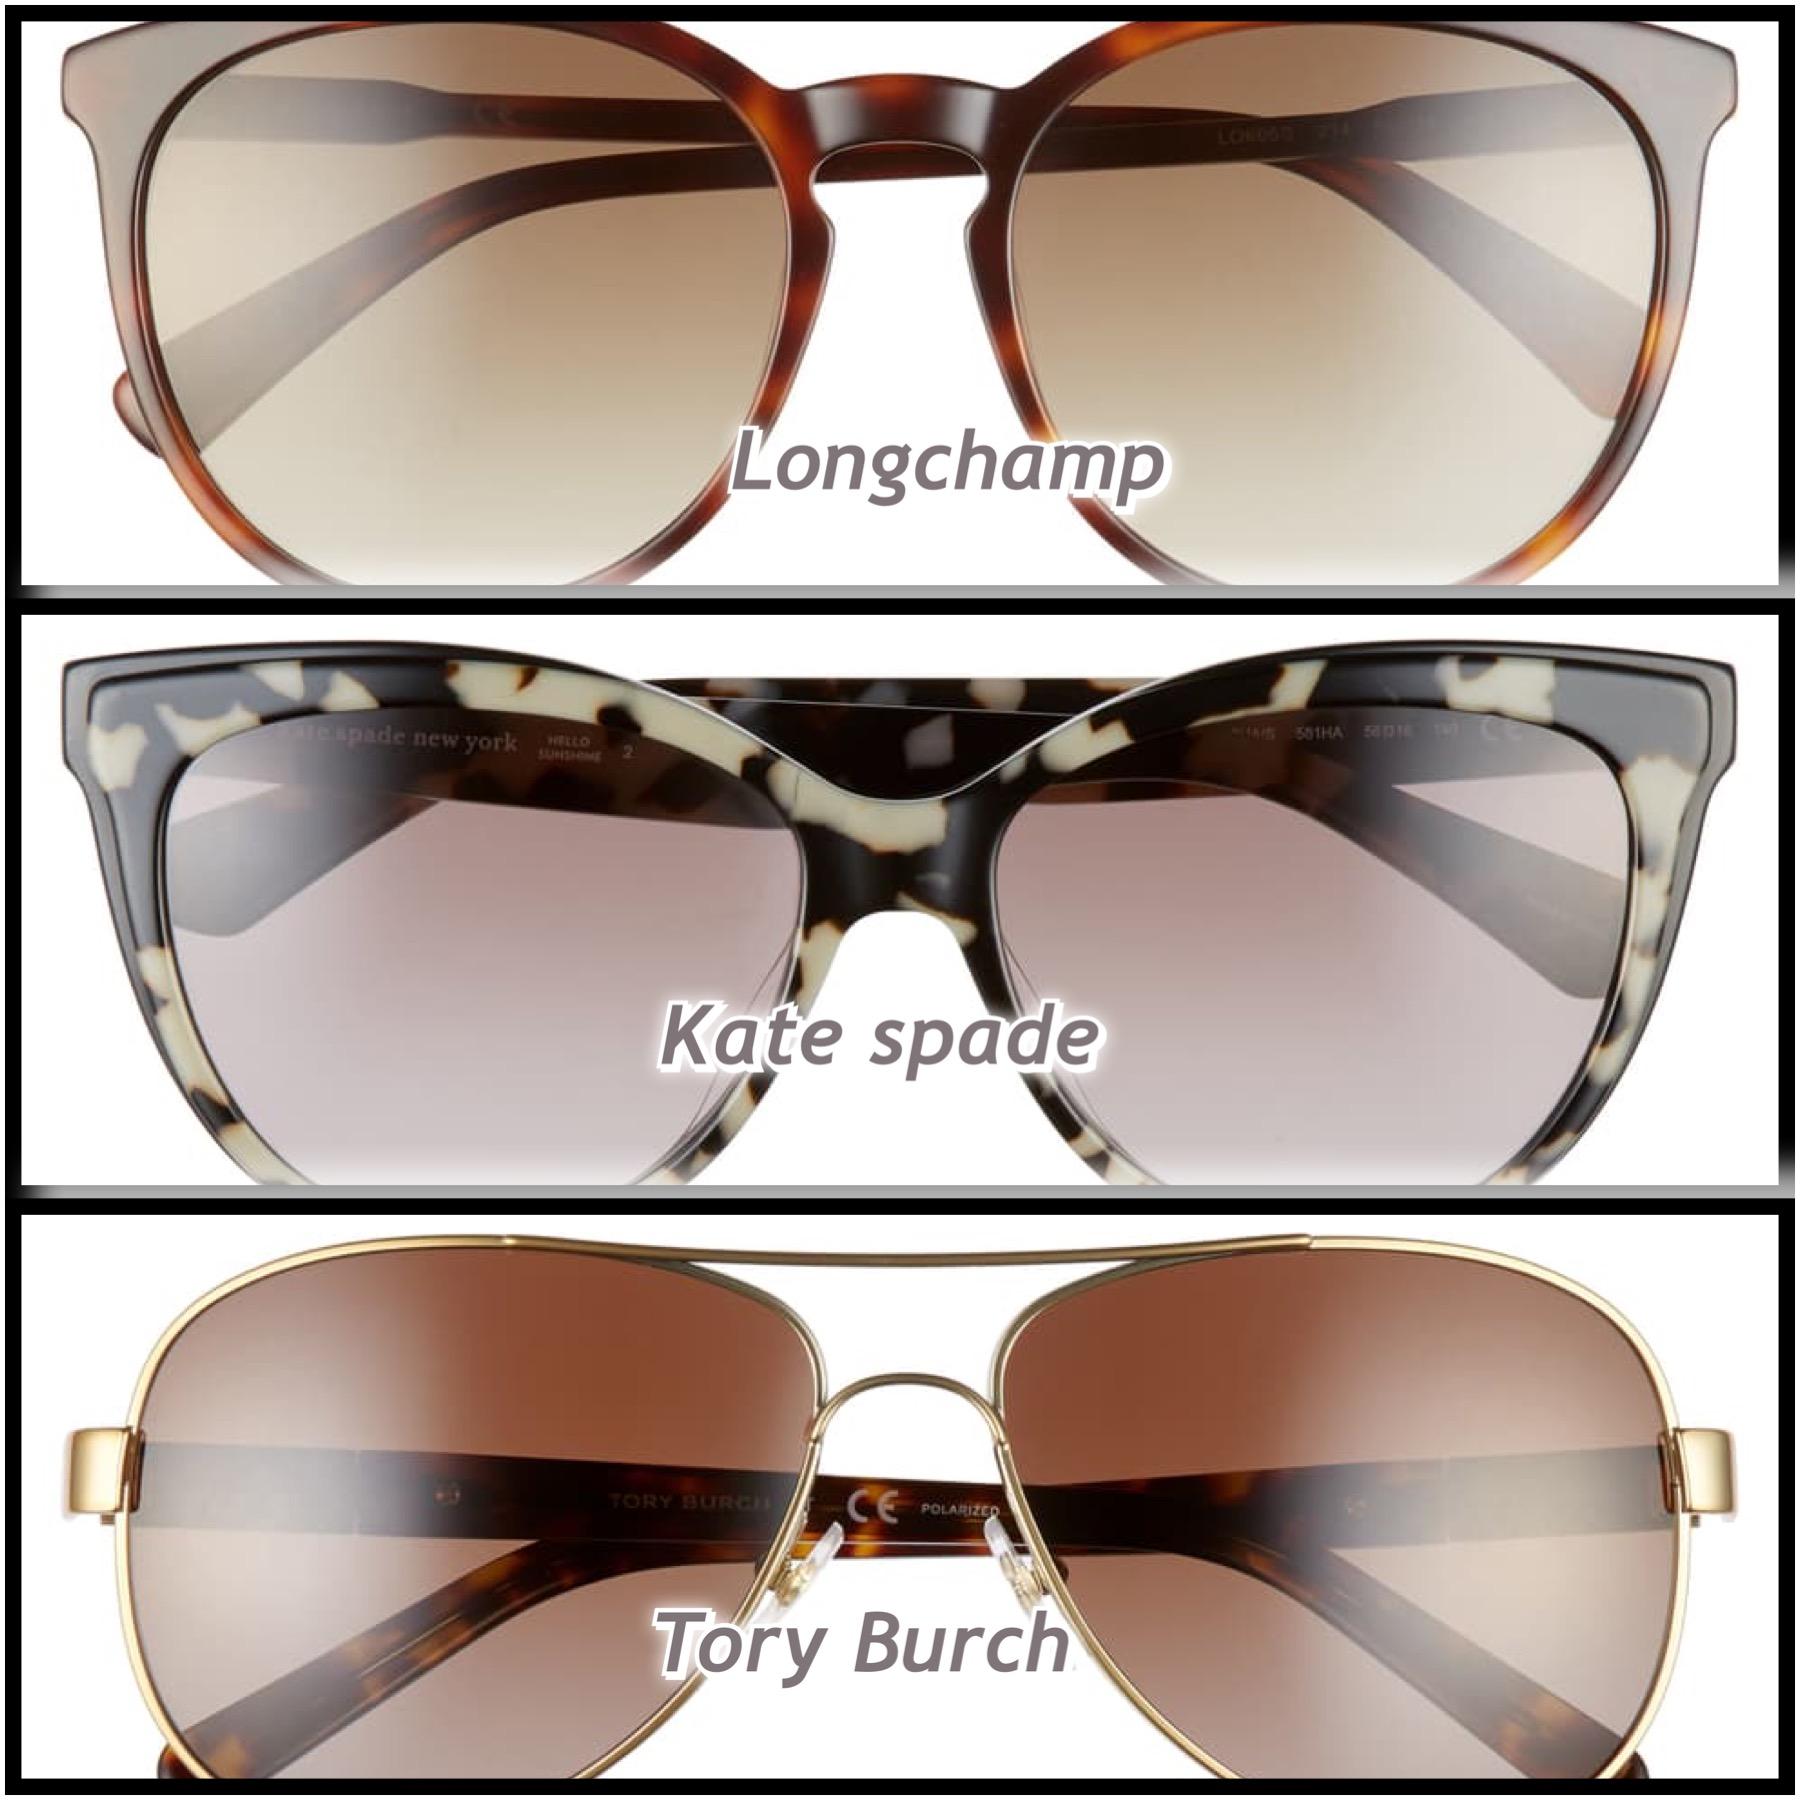 Nordstrom Anniversary Sale: Handbags & Sunglasses